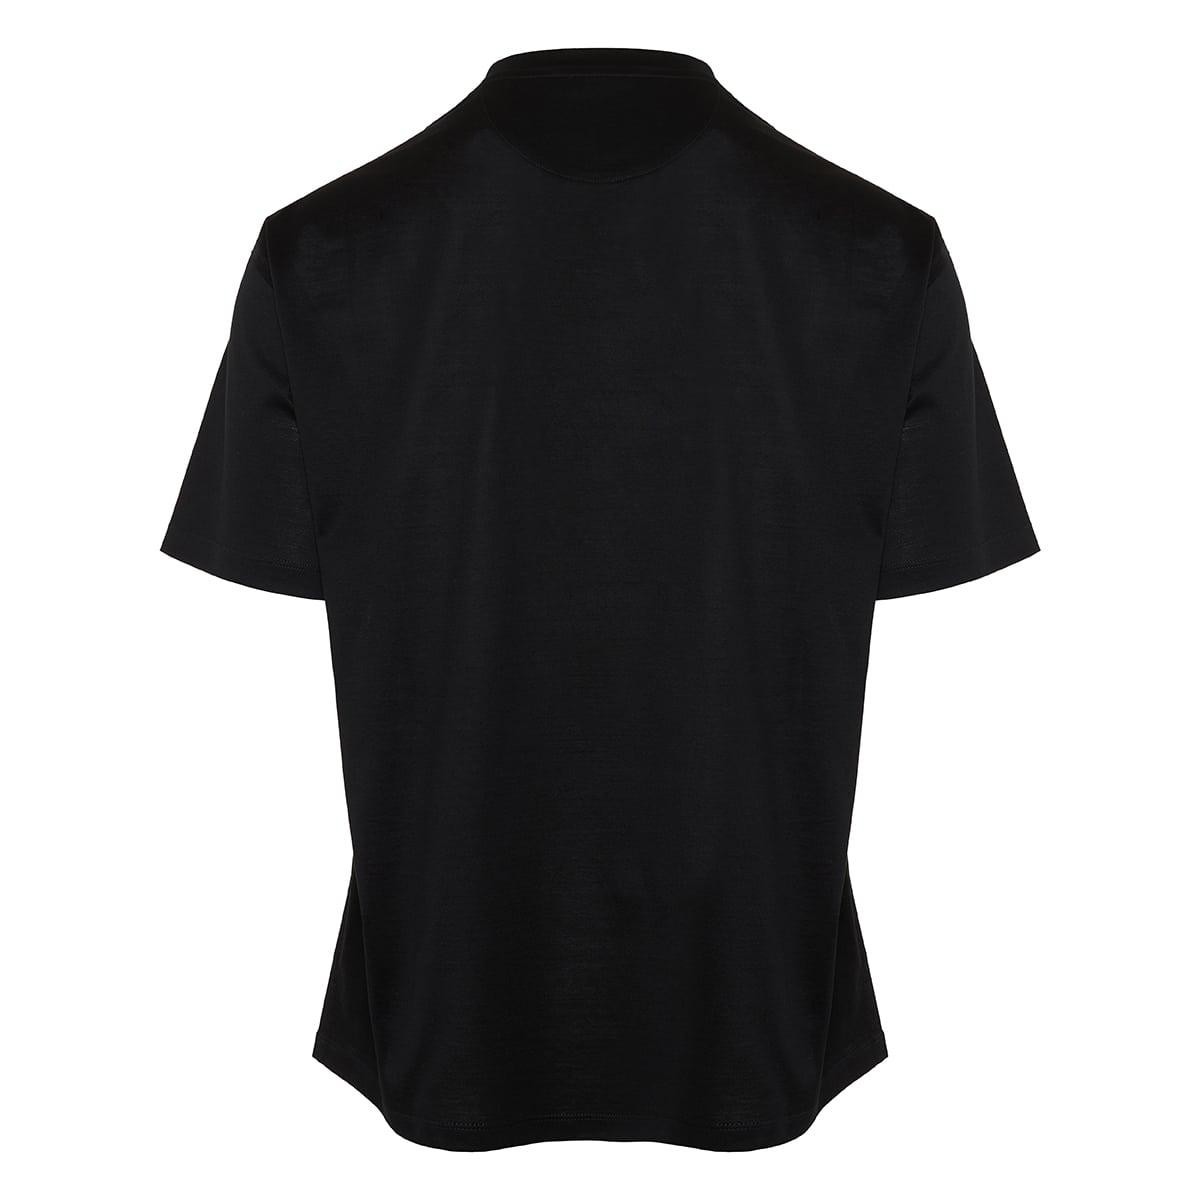 VLTN cotton t-shirt